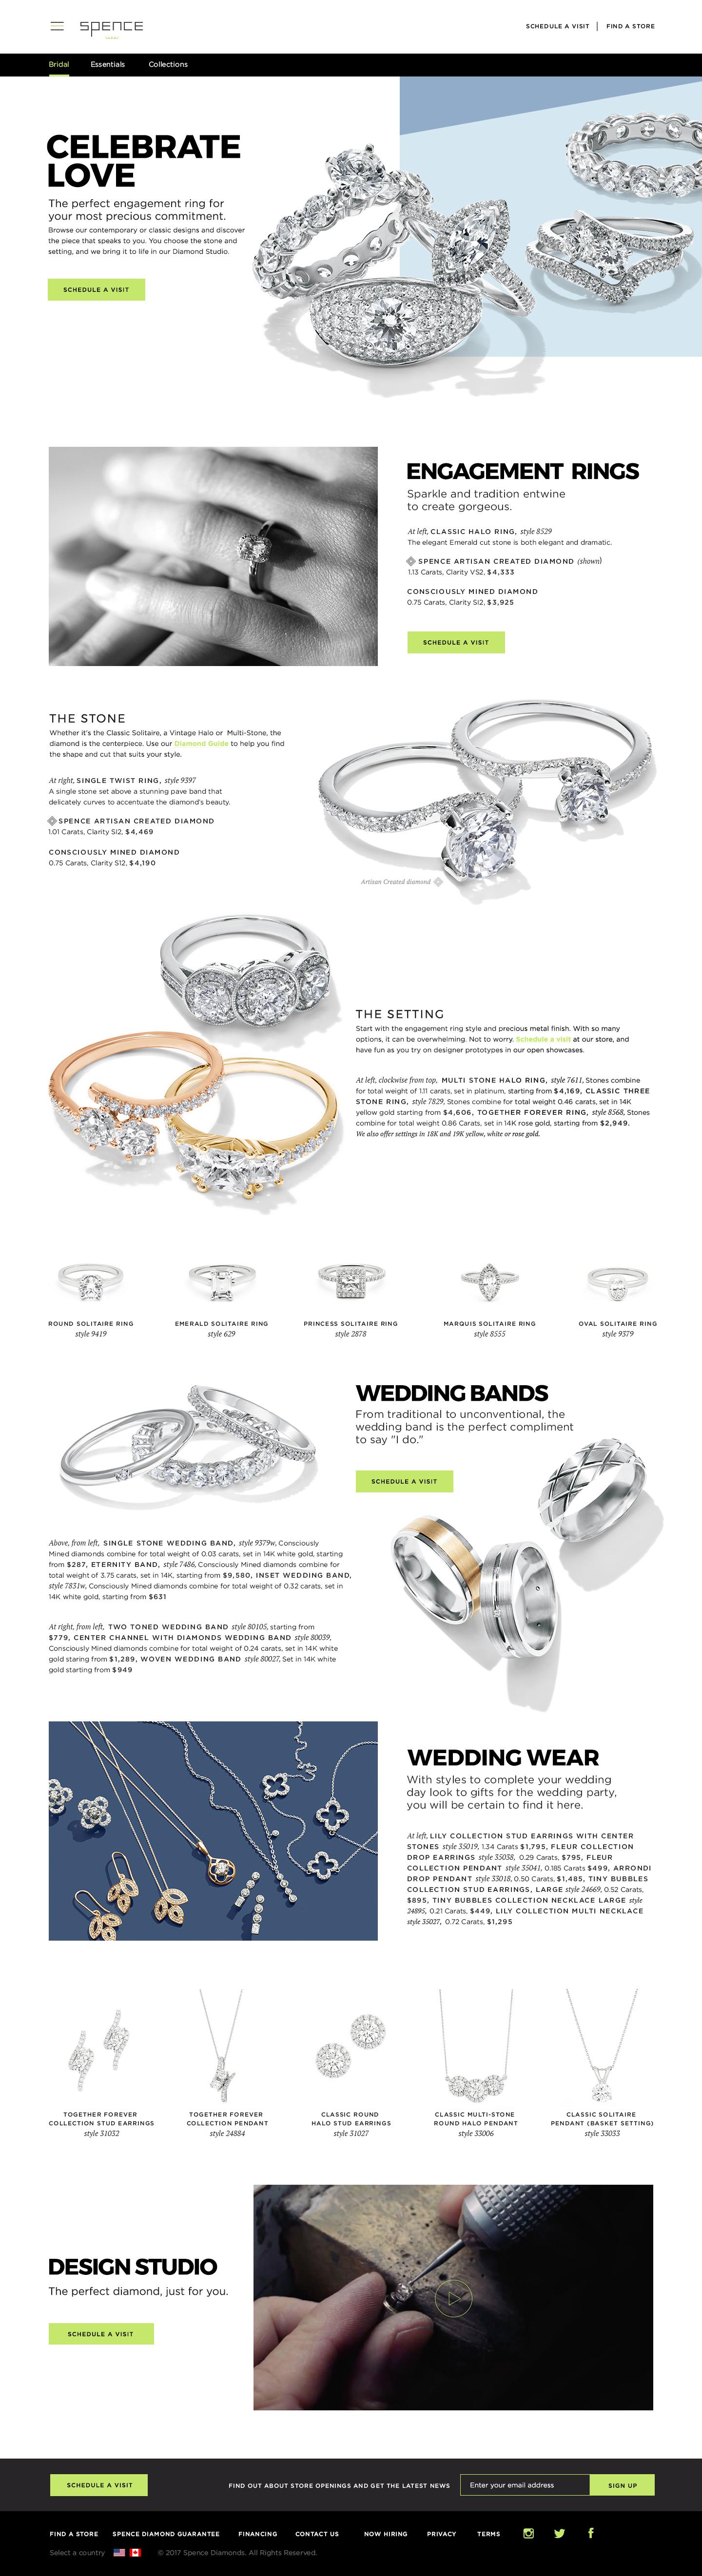 Spence Bridal Page.jpg